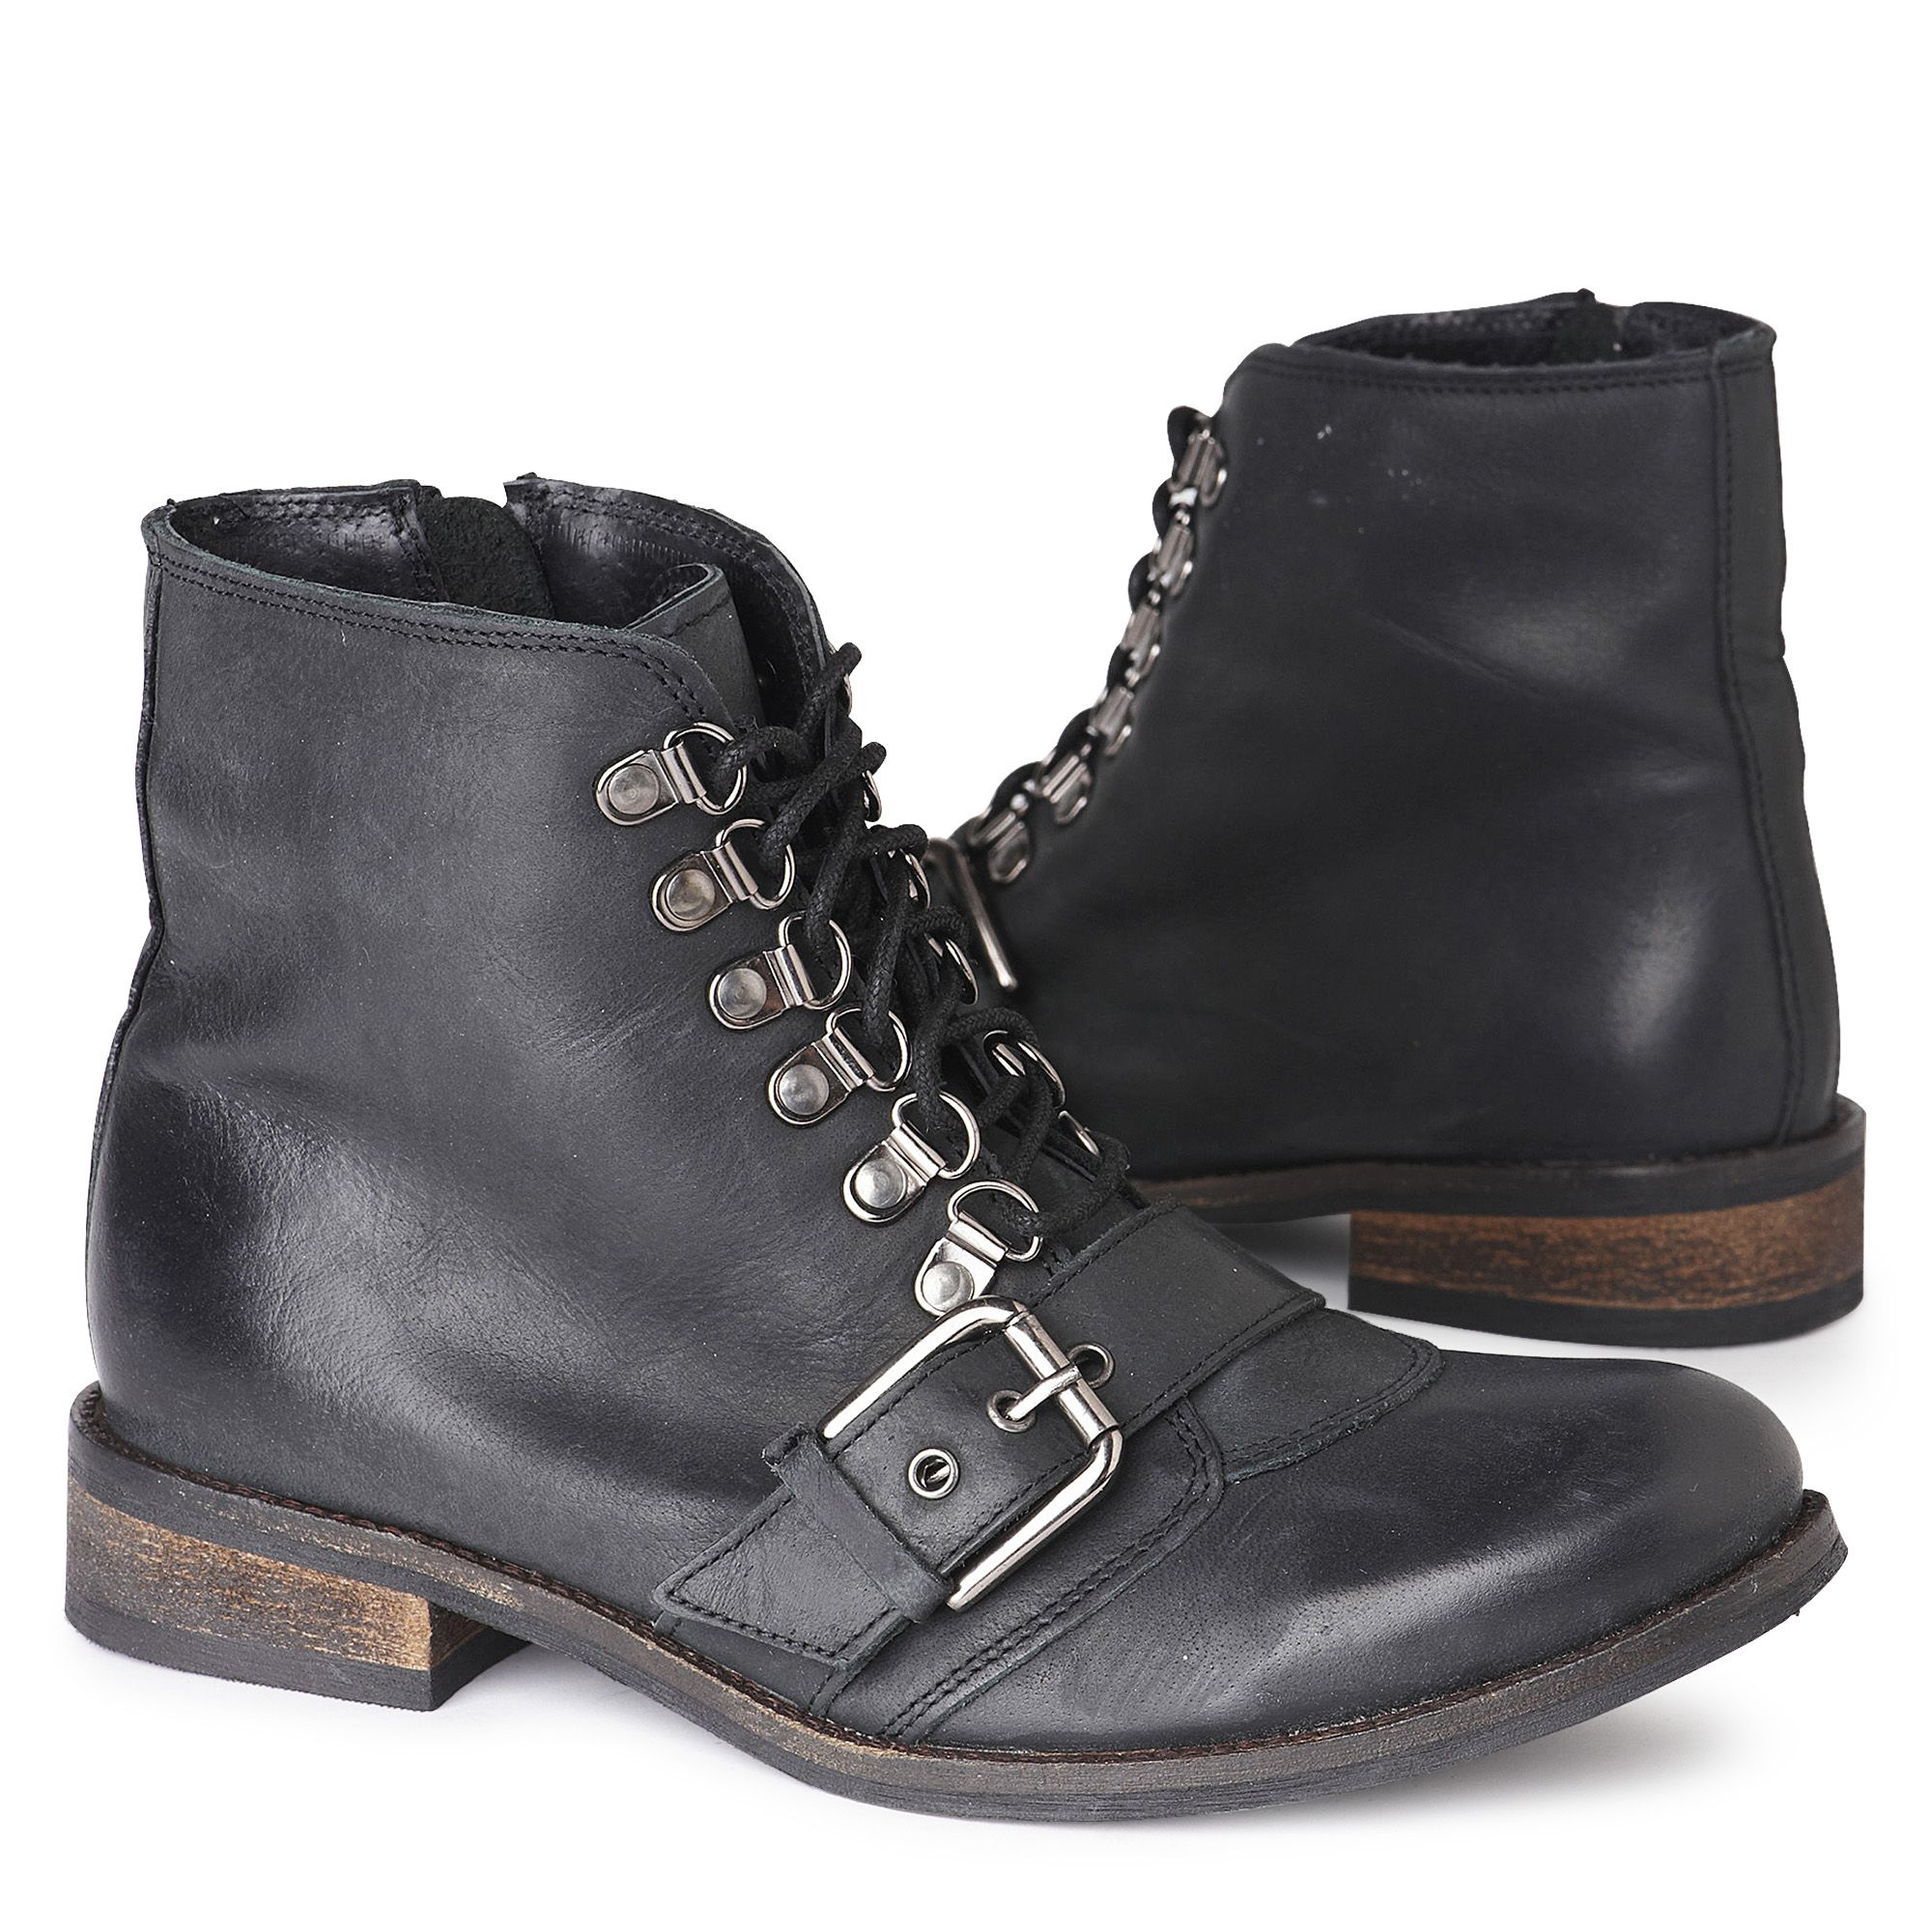 Carvela Kurt Geiger Sidestep Work Boots Black In Black   Lyst